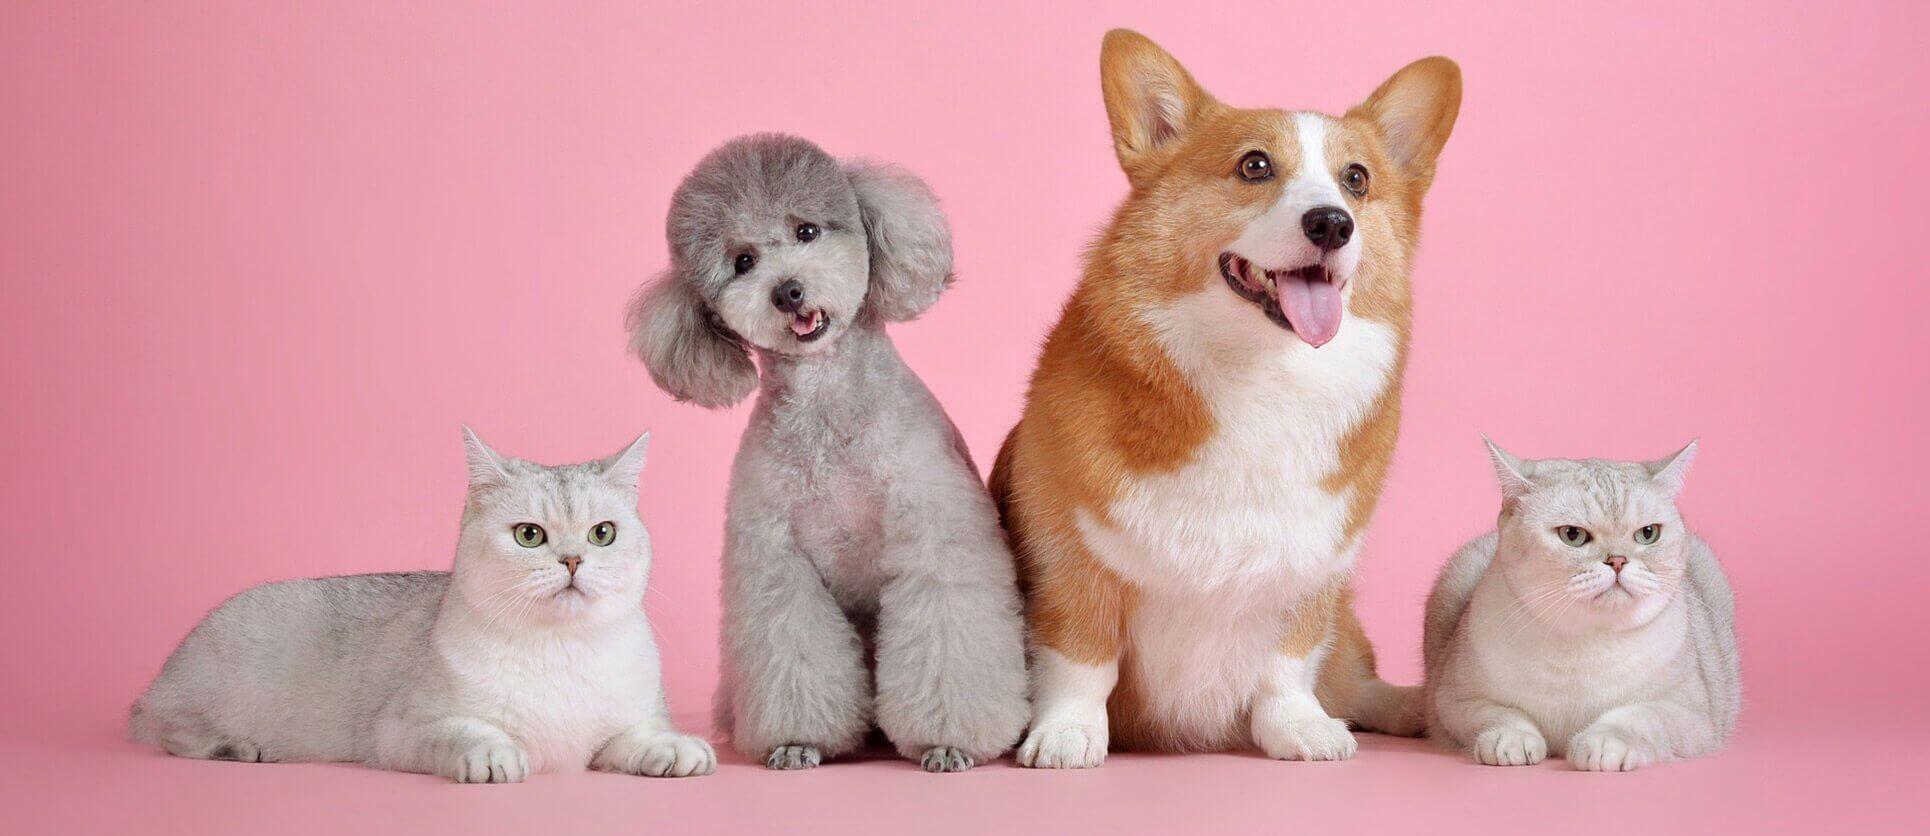 pet shop περιστέρι αττικής